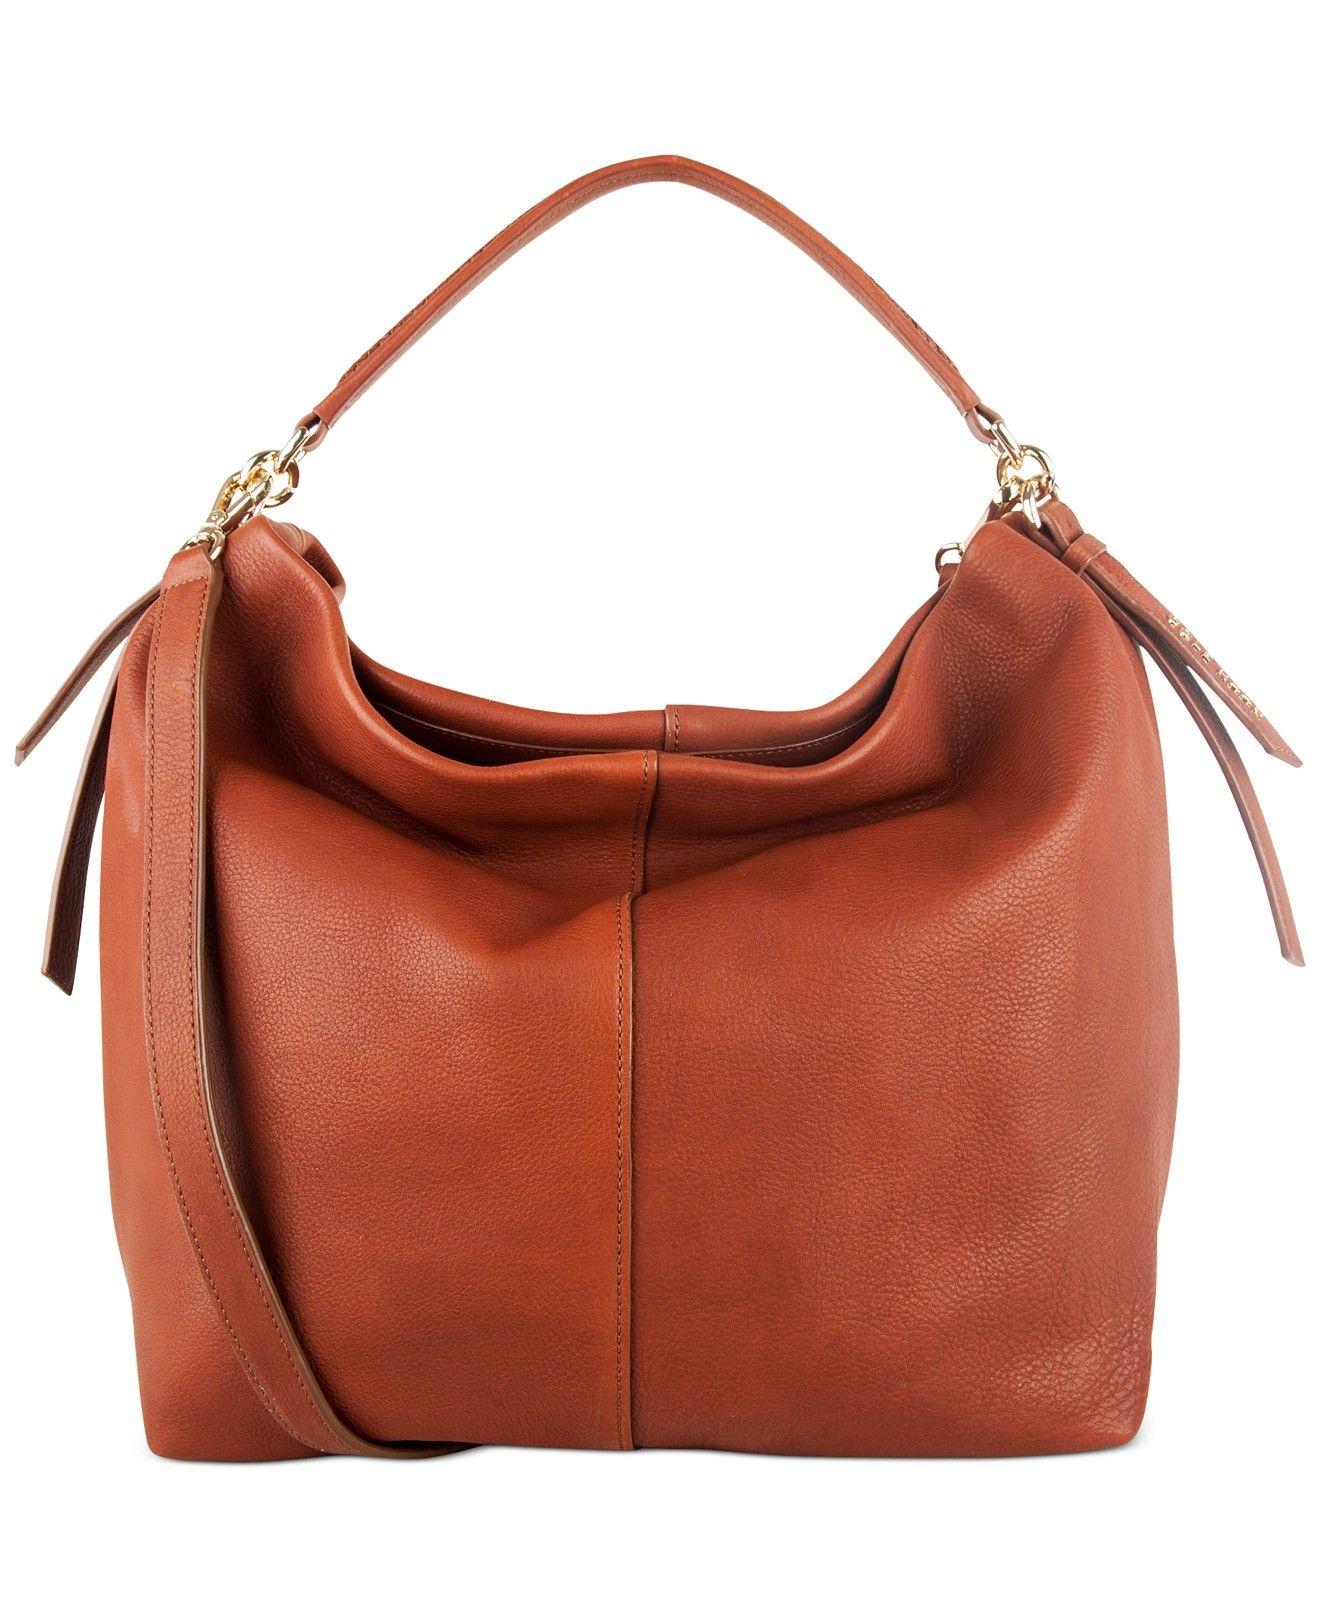 Cole Haan Lockhart Double Strap Hobo All Handbags